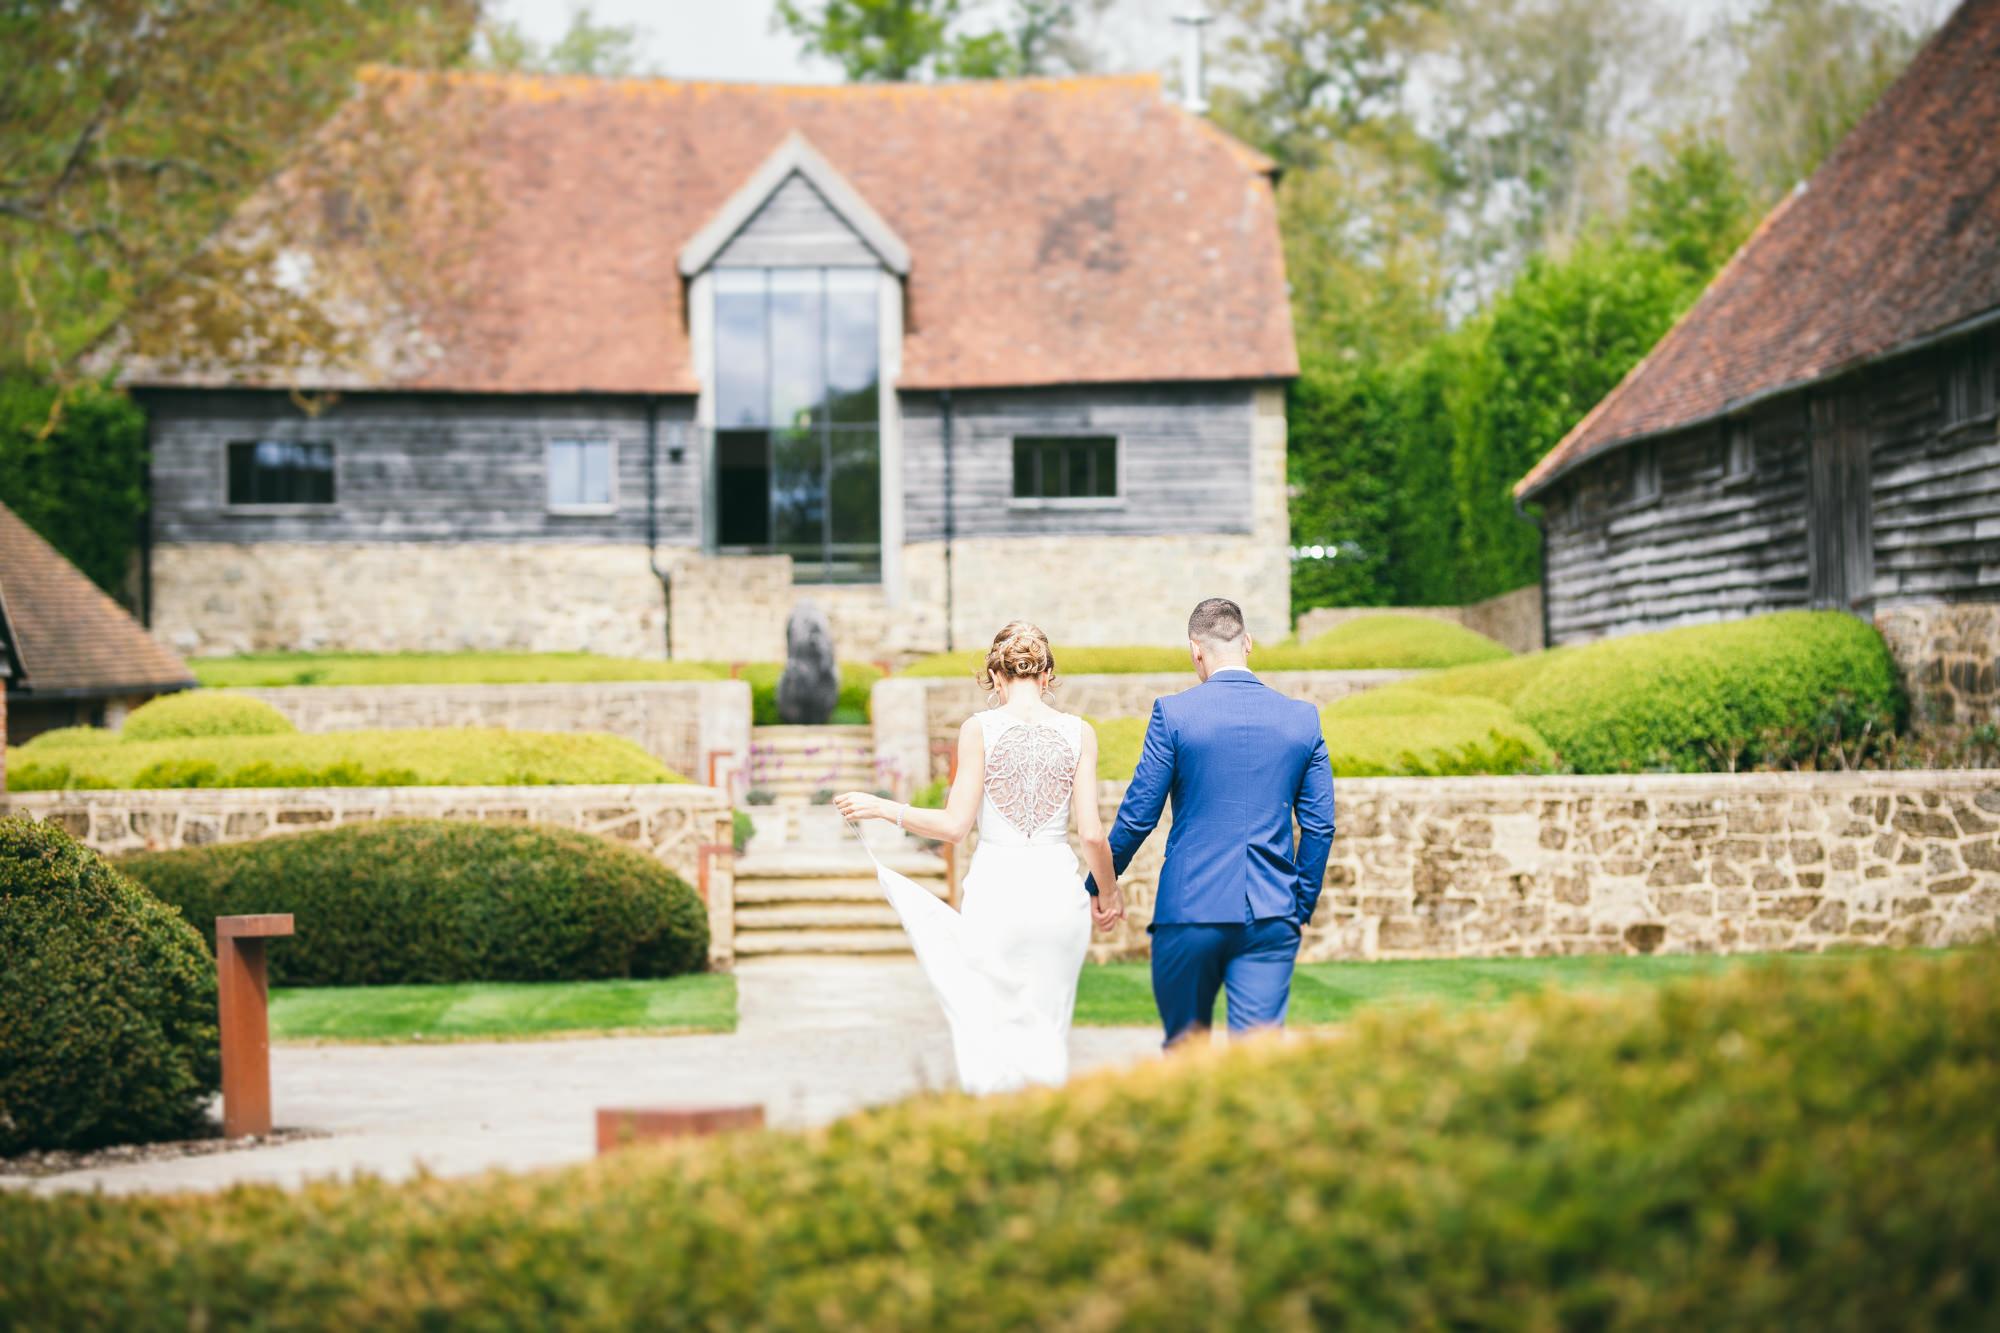 Bride and Groom Rustic Barn Wedding Photography in Nyetimber Sussex Ieva Vilcinskaite Photography